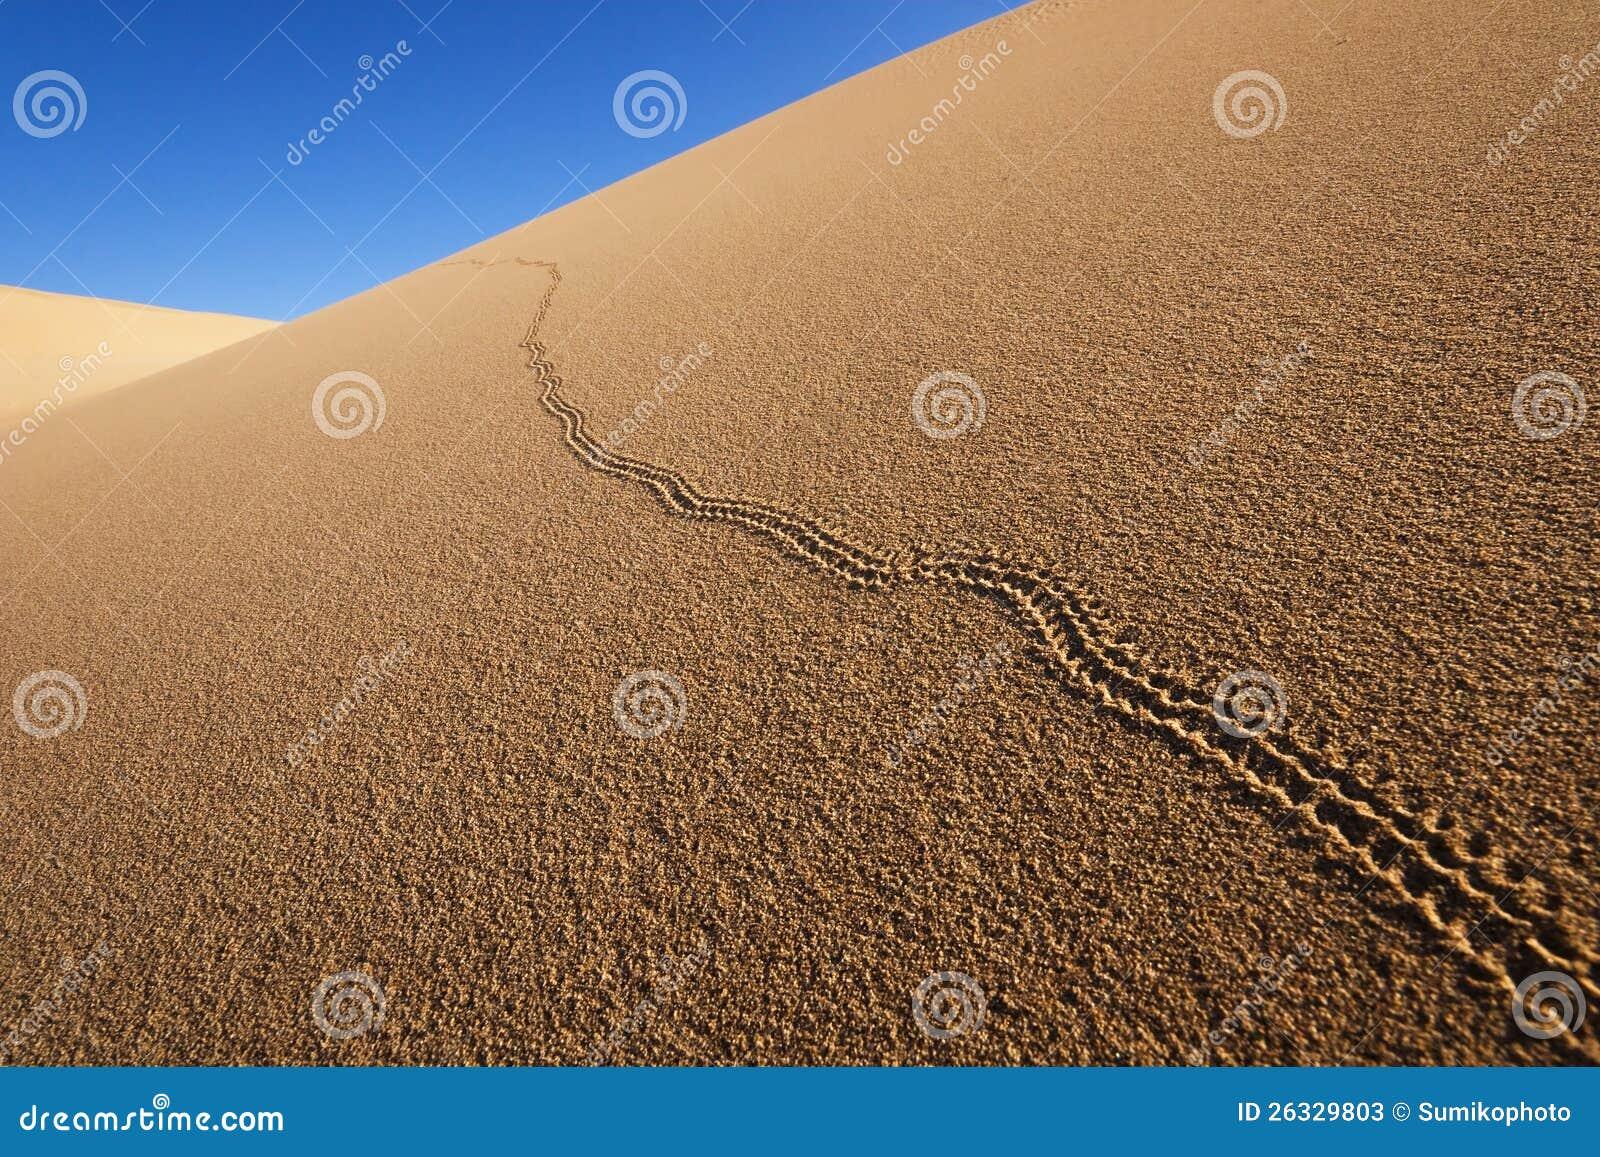 Beetle Tracks On Sand Dunes Stock Image Image Of Blue